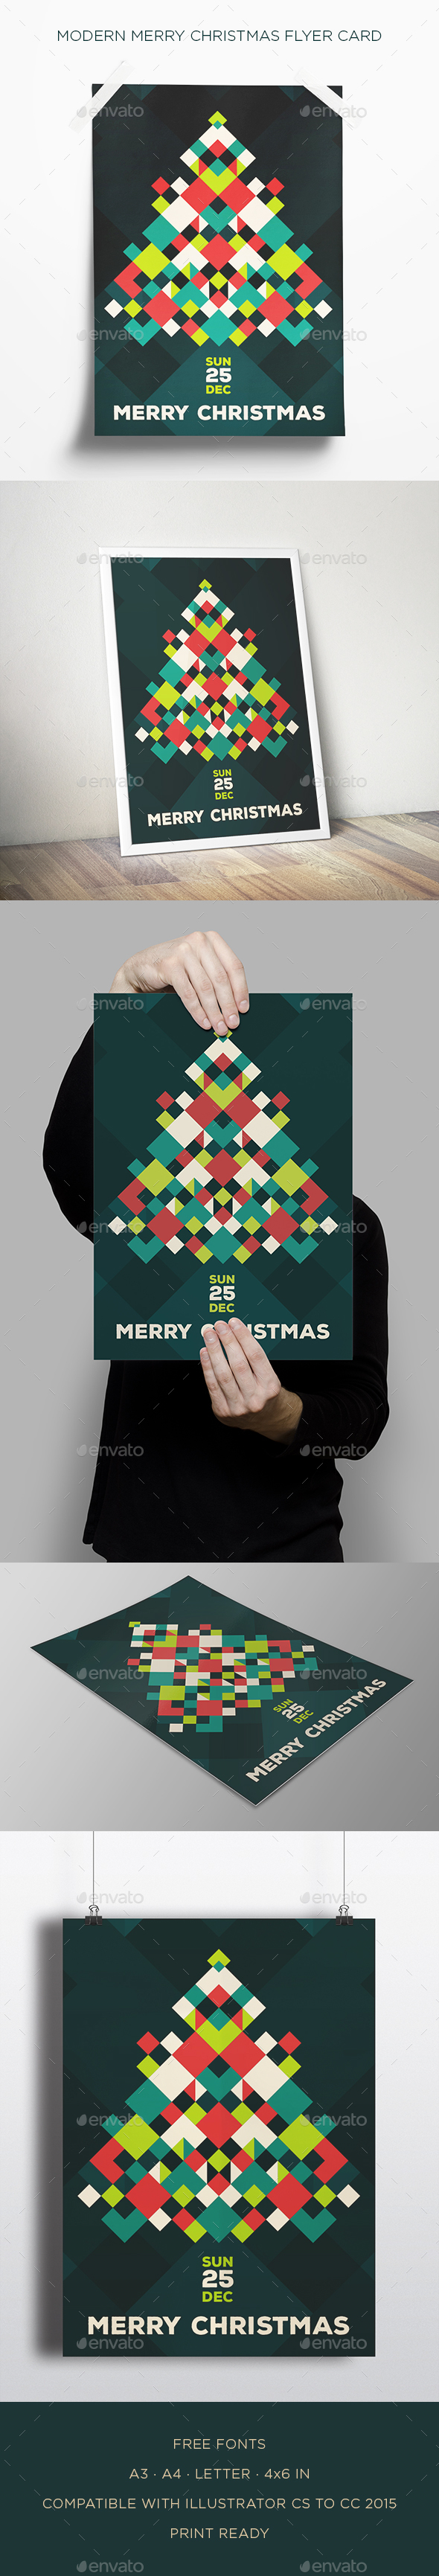 Modern Merry Christmas Flyer Card - Flyers Print Templates